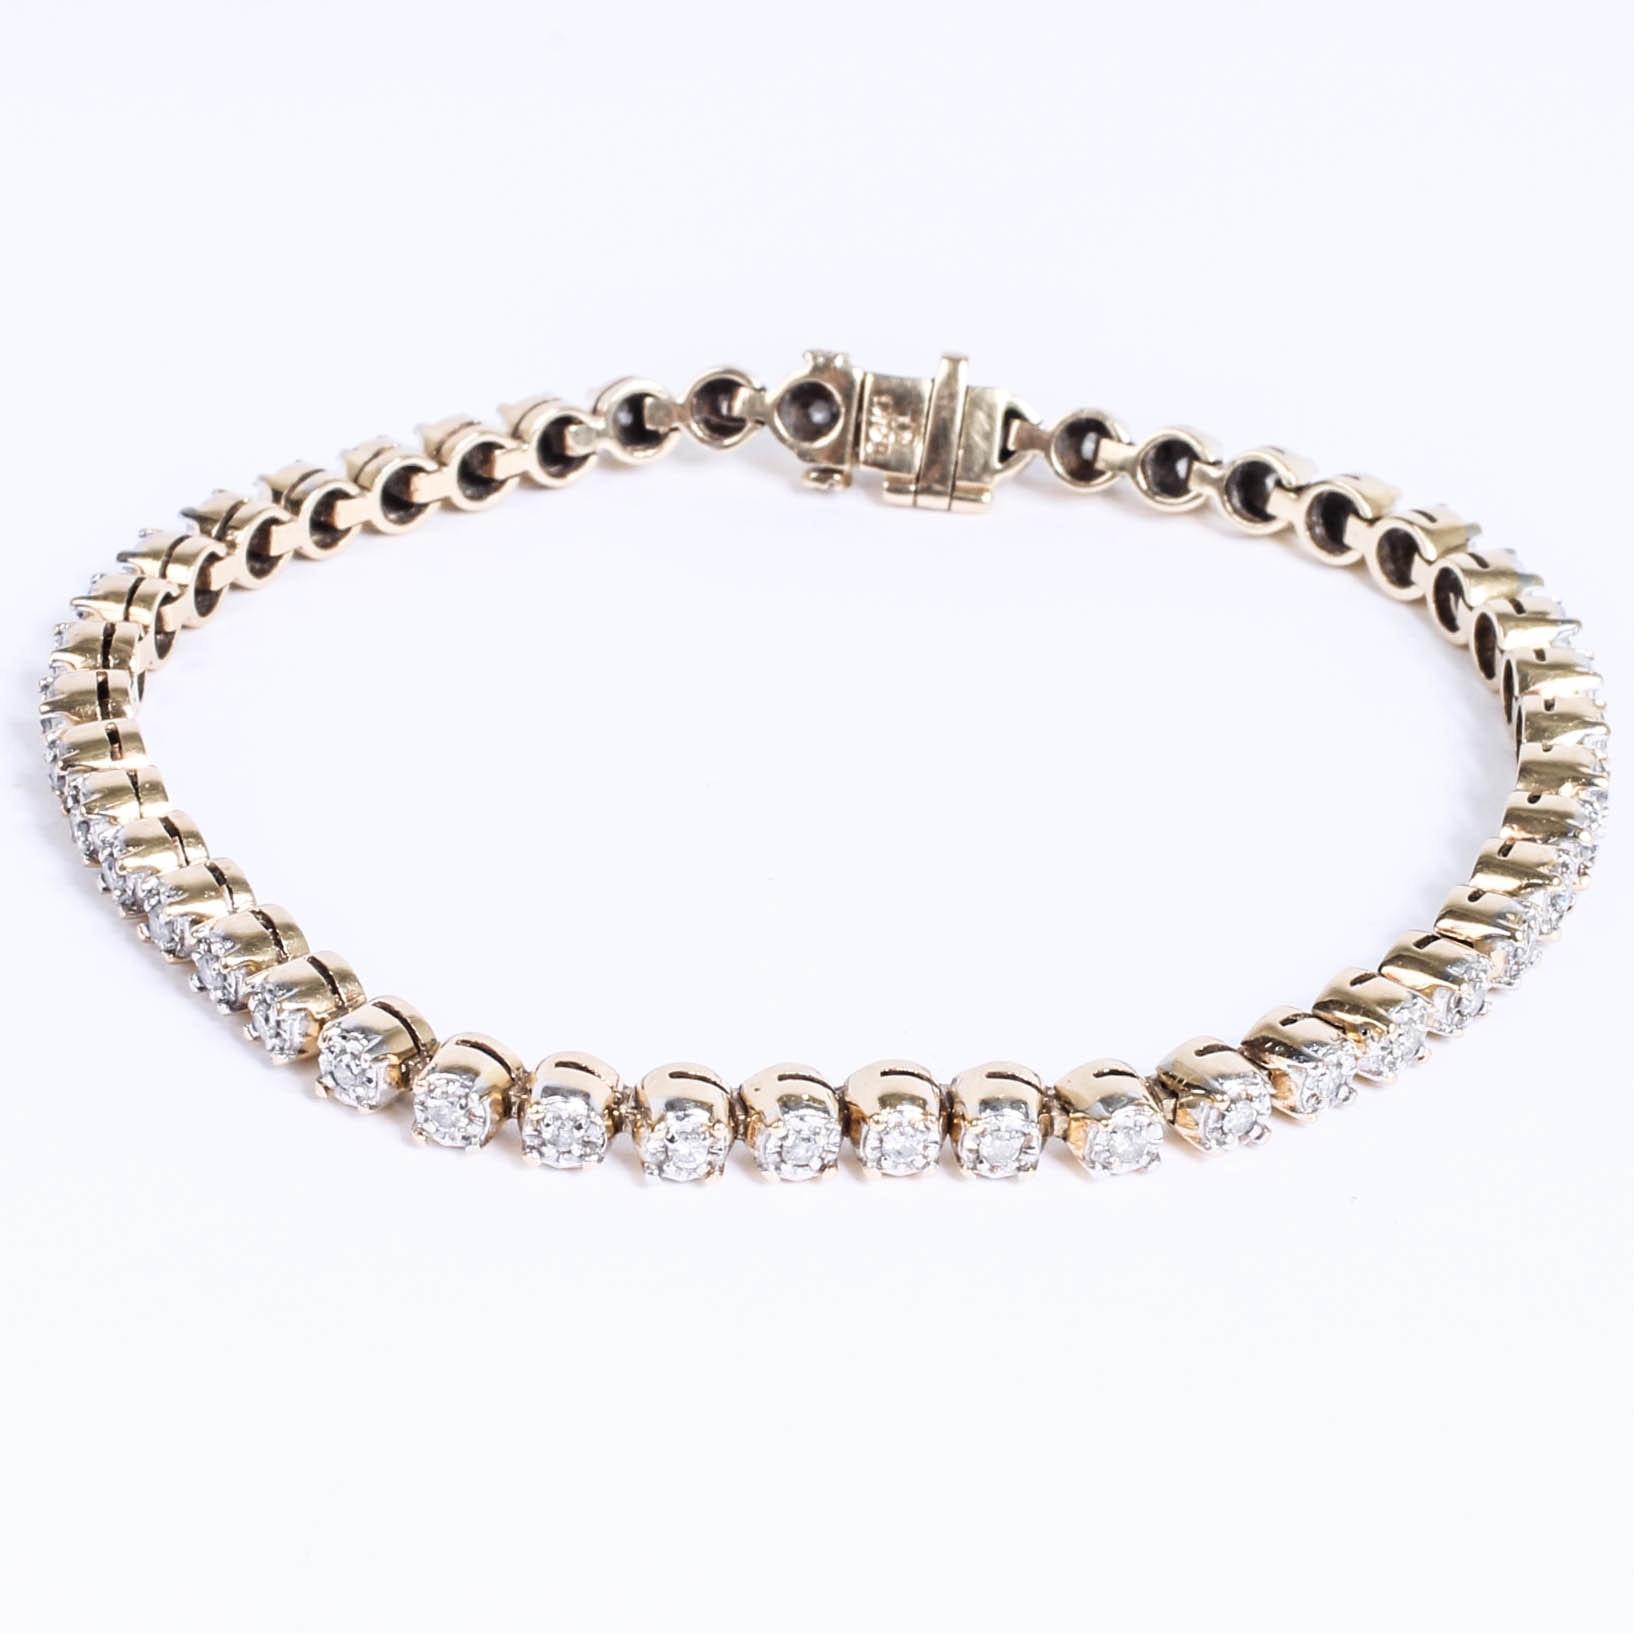 14K Yellow Gold and Diamond Barrel Link Bracelet